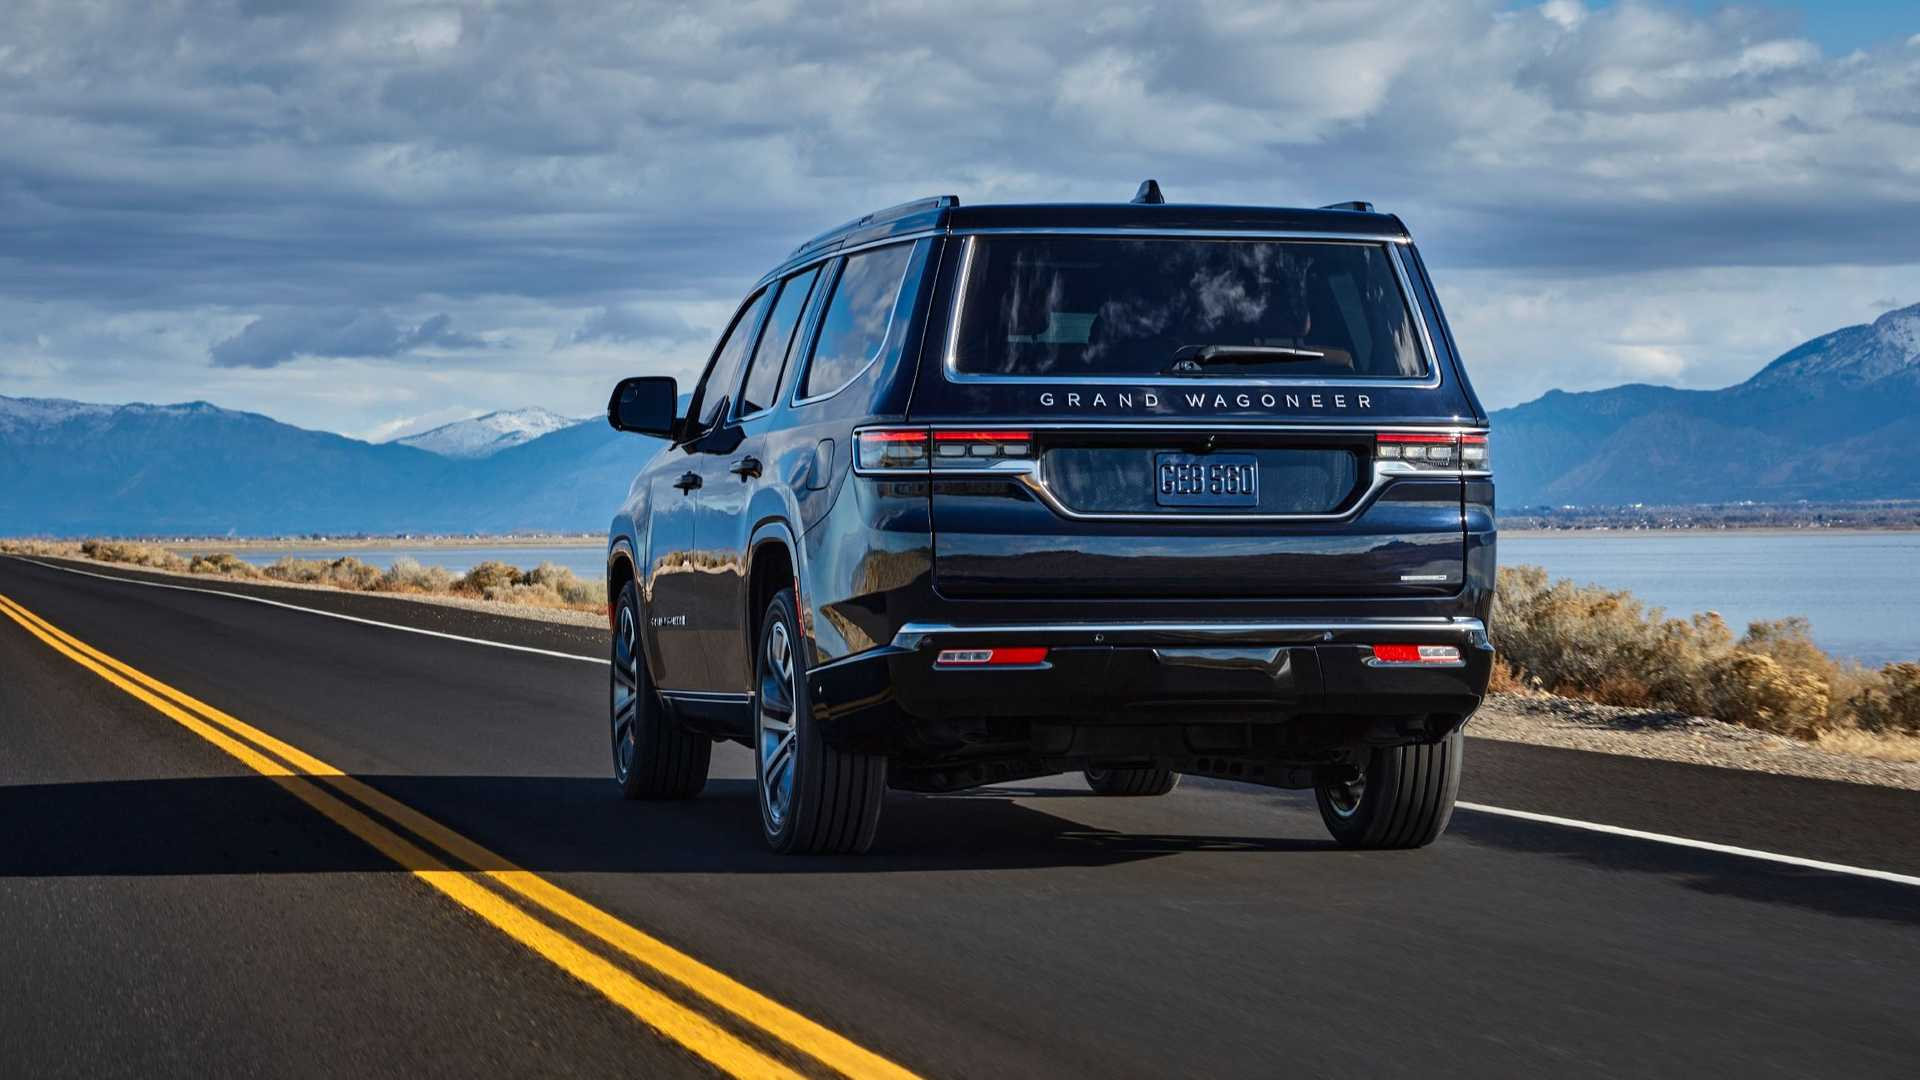 2022-jeep-grand-wagoneer-exterior-rear-quarter-4